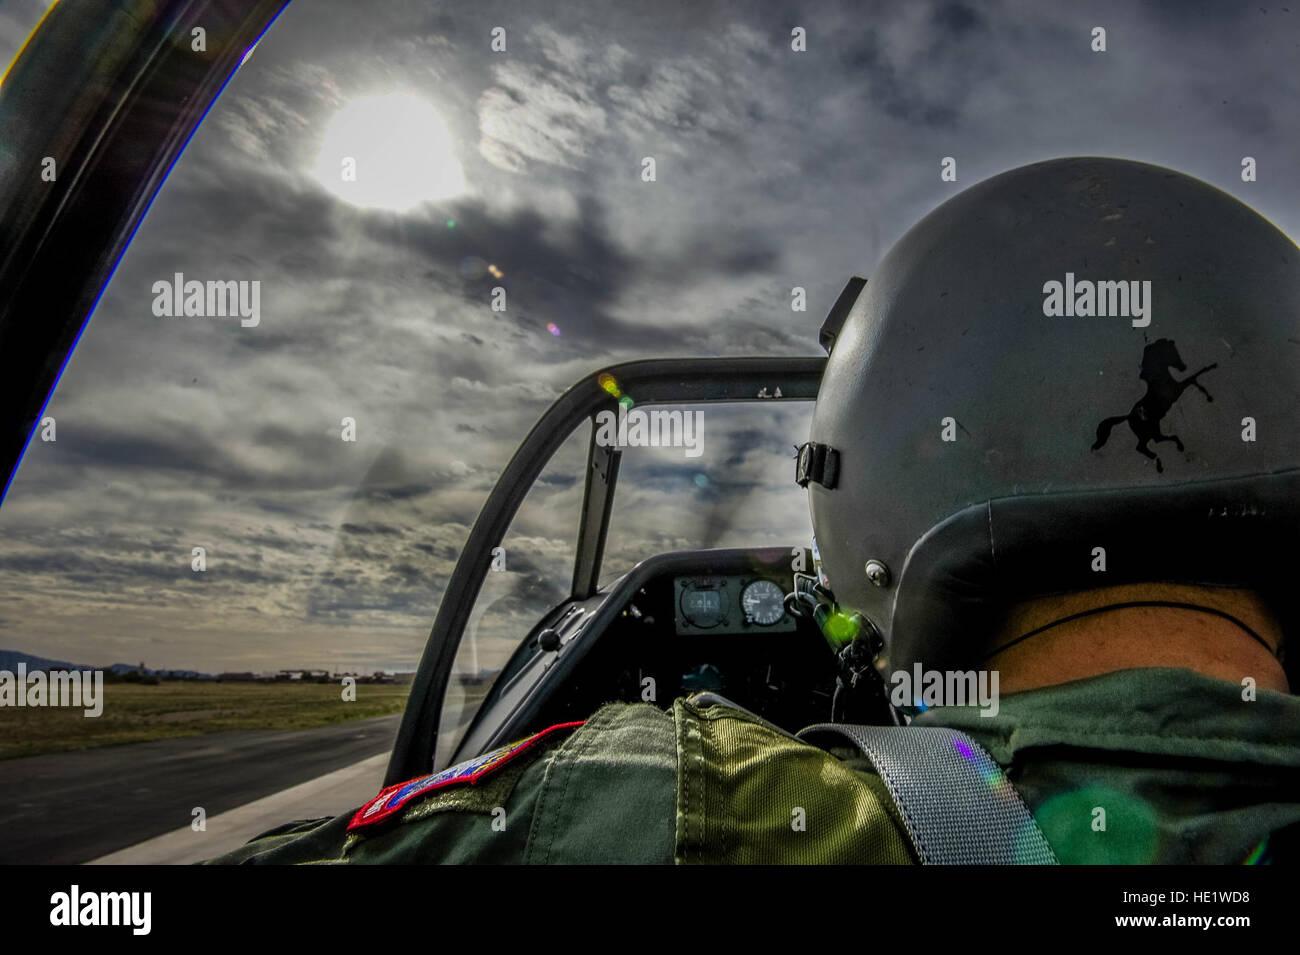 Vlado Lenoch, a pilot with Air Combat CommandÕs Heritage Flight program, taxis the runway at Davis-Monthan Air Force Stock Photo